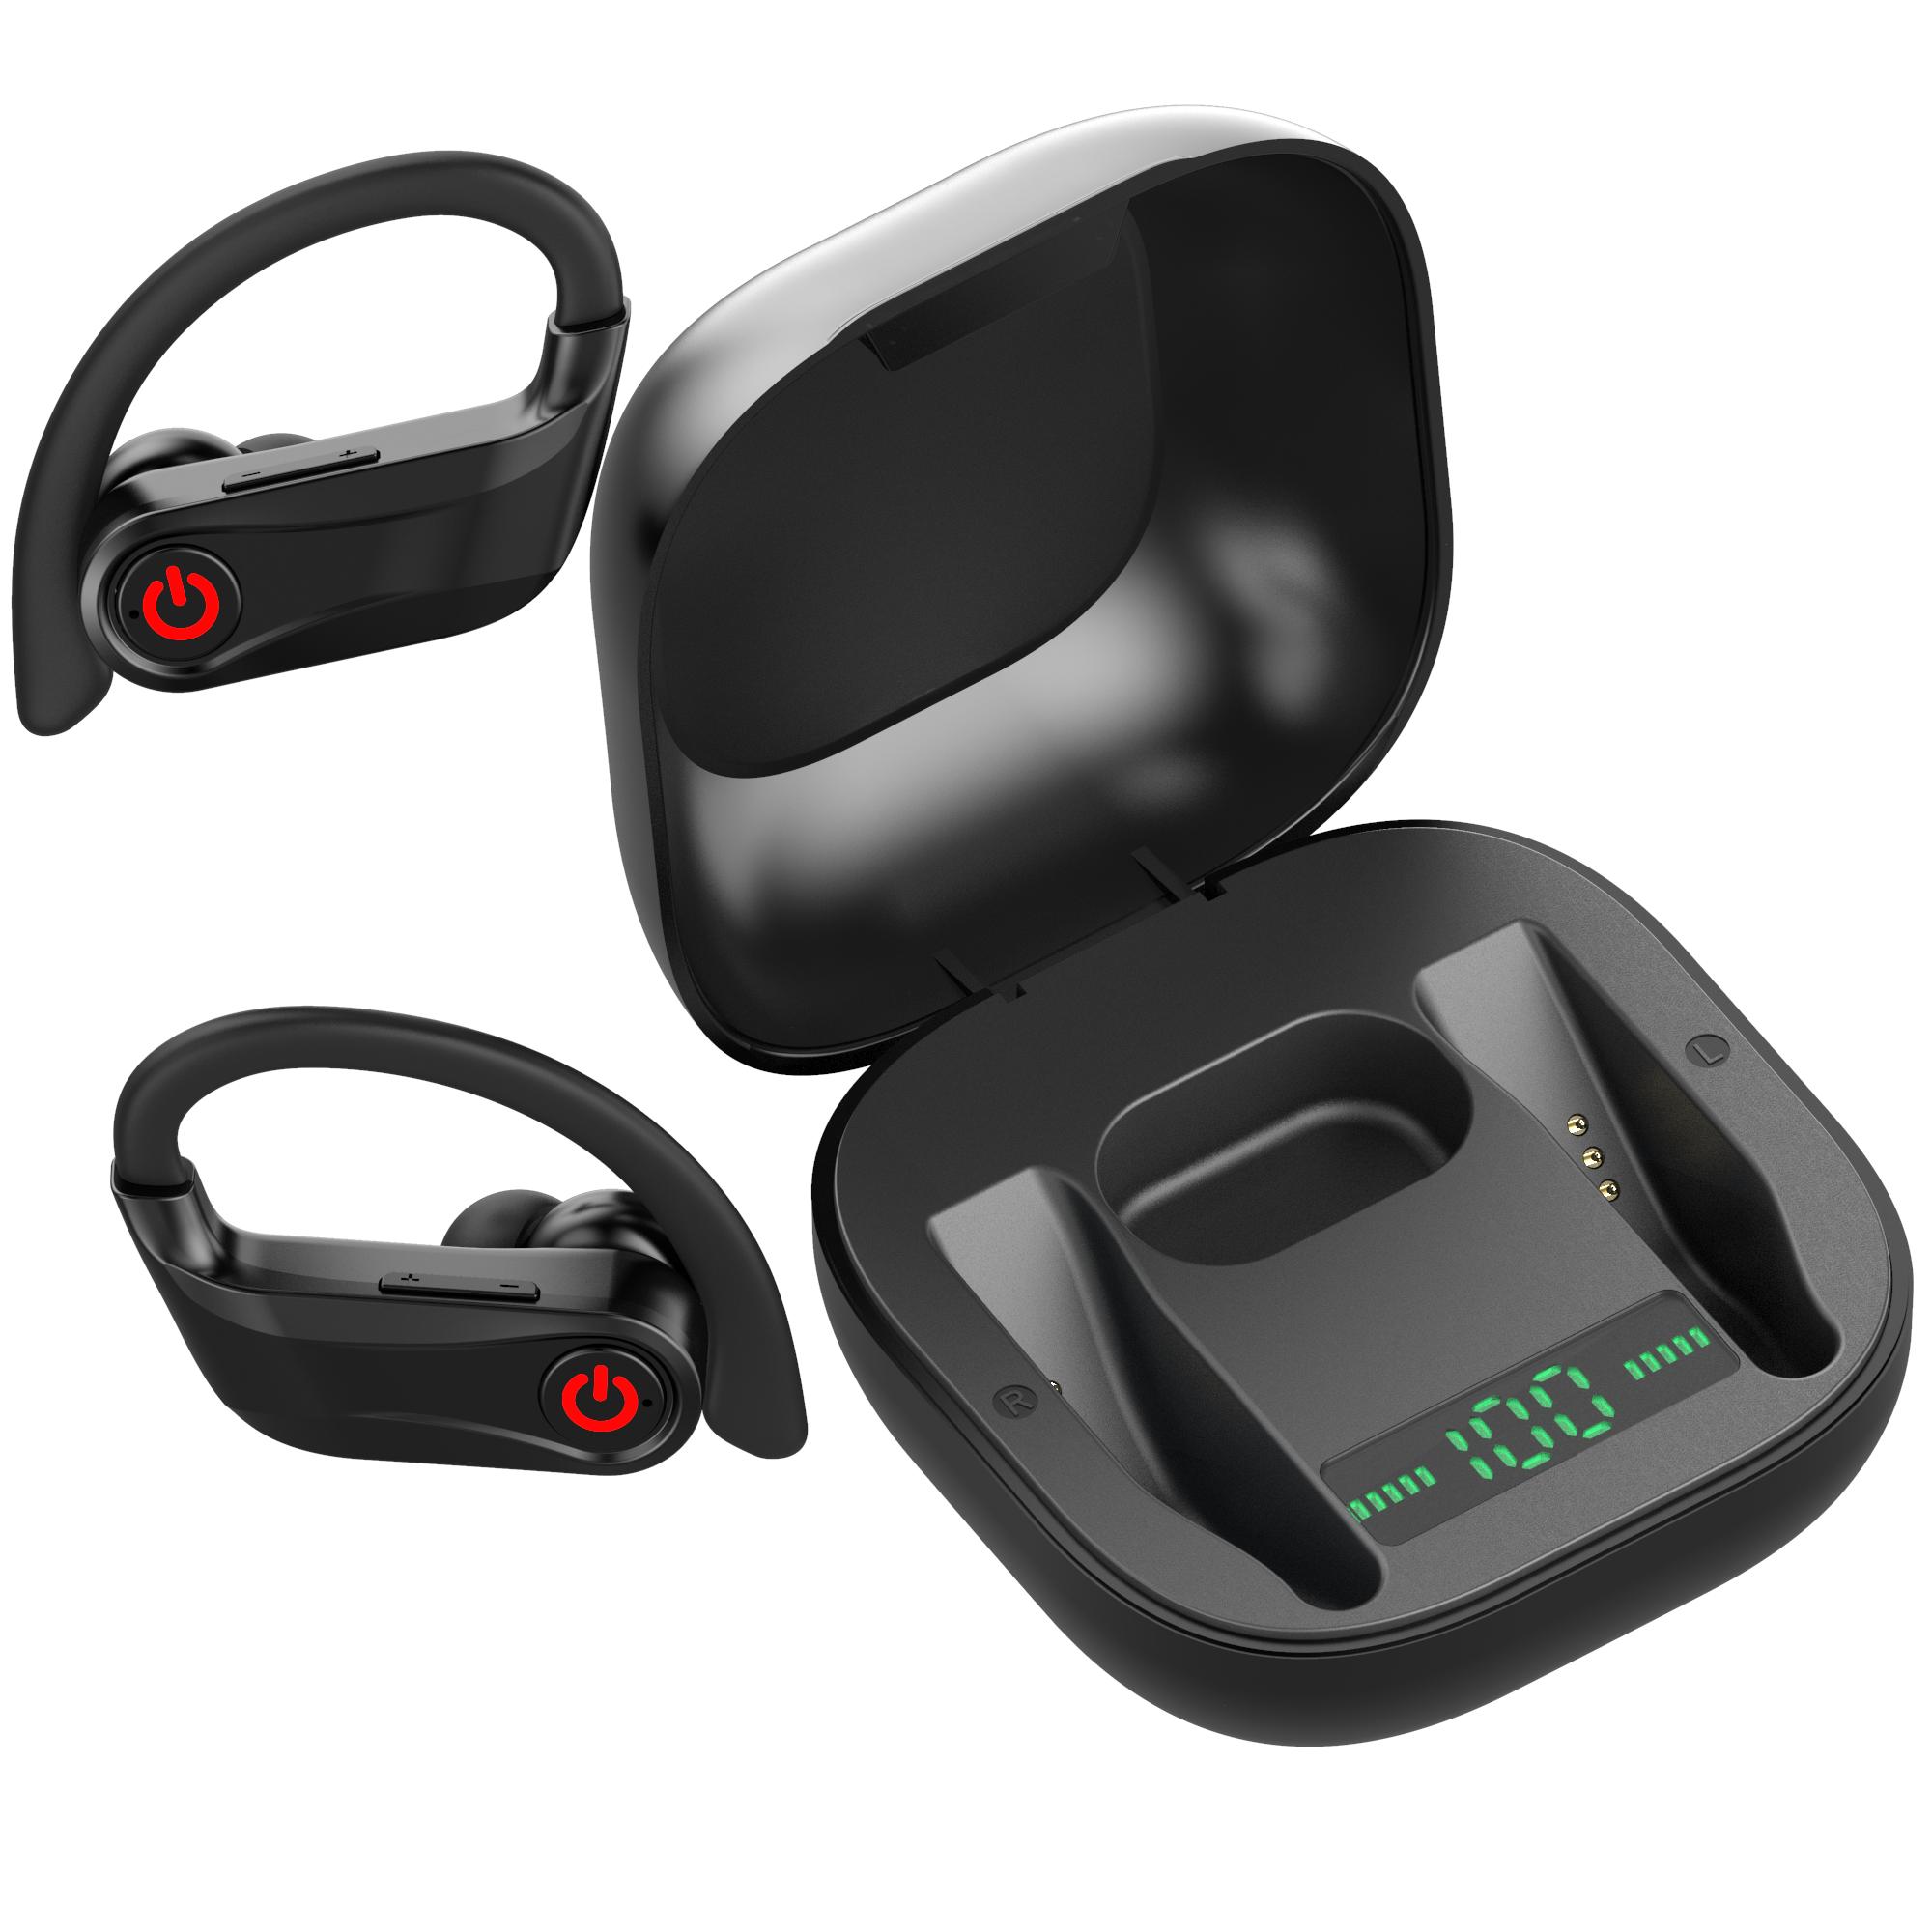 5.0 Bt Vision Wireless Earhook Tws Headphone Sports Blue Tooth Earbuds - idealBuds Earphone | idealBuds.net